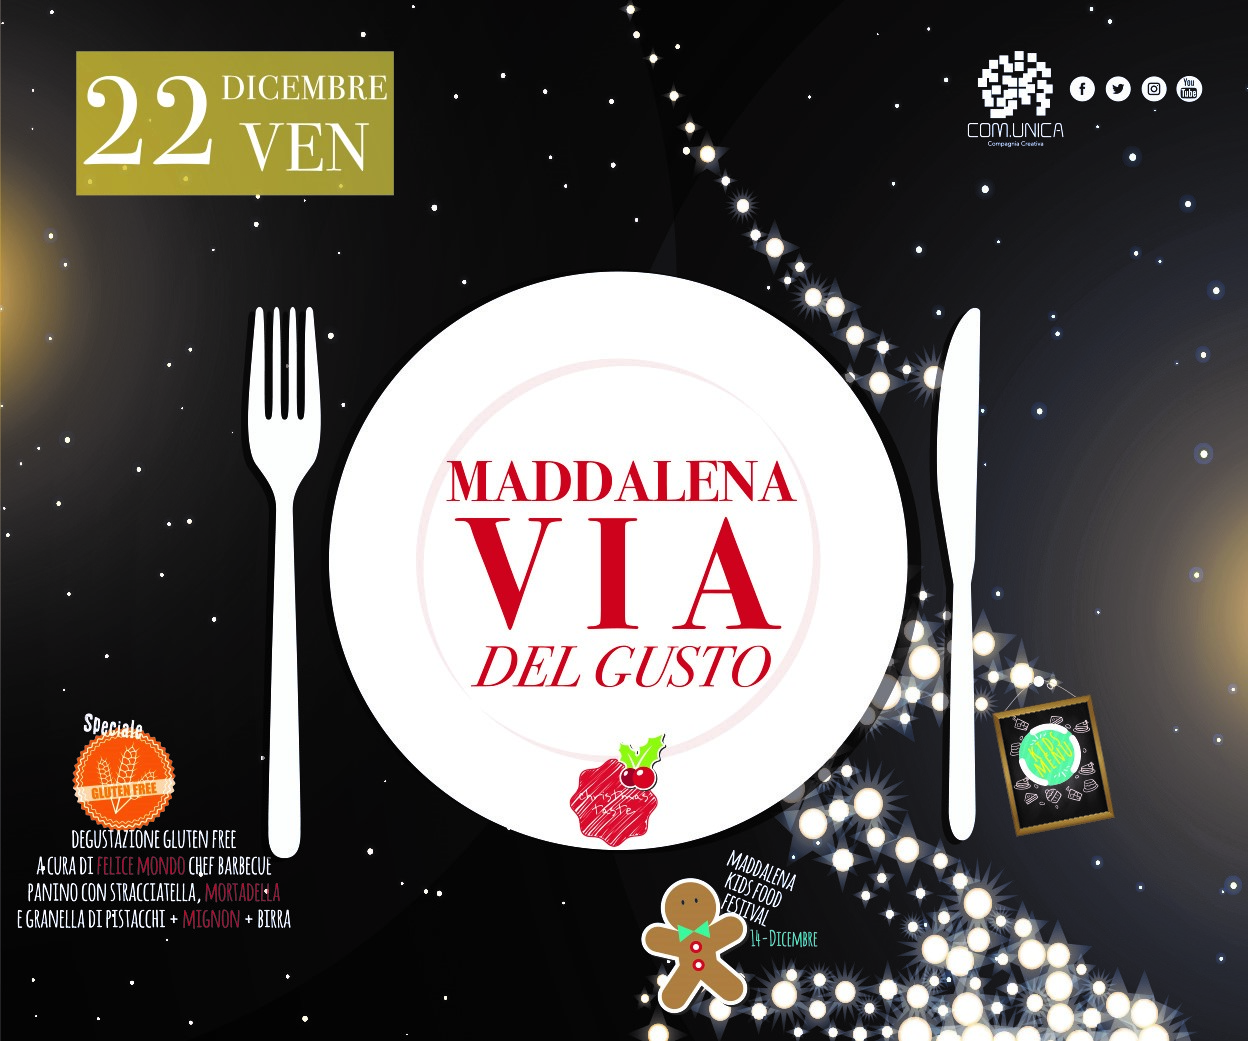 Maddalena via del gusto- medium banner 300x250